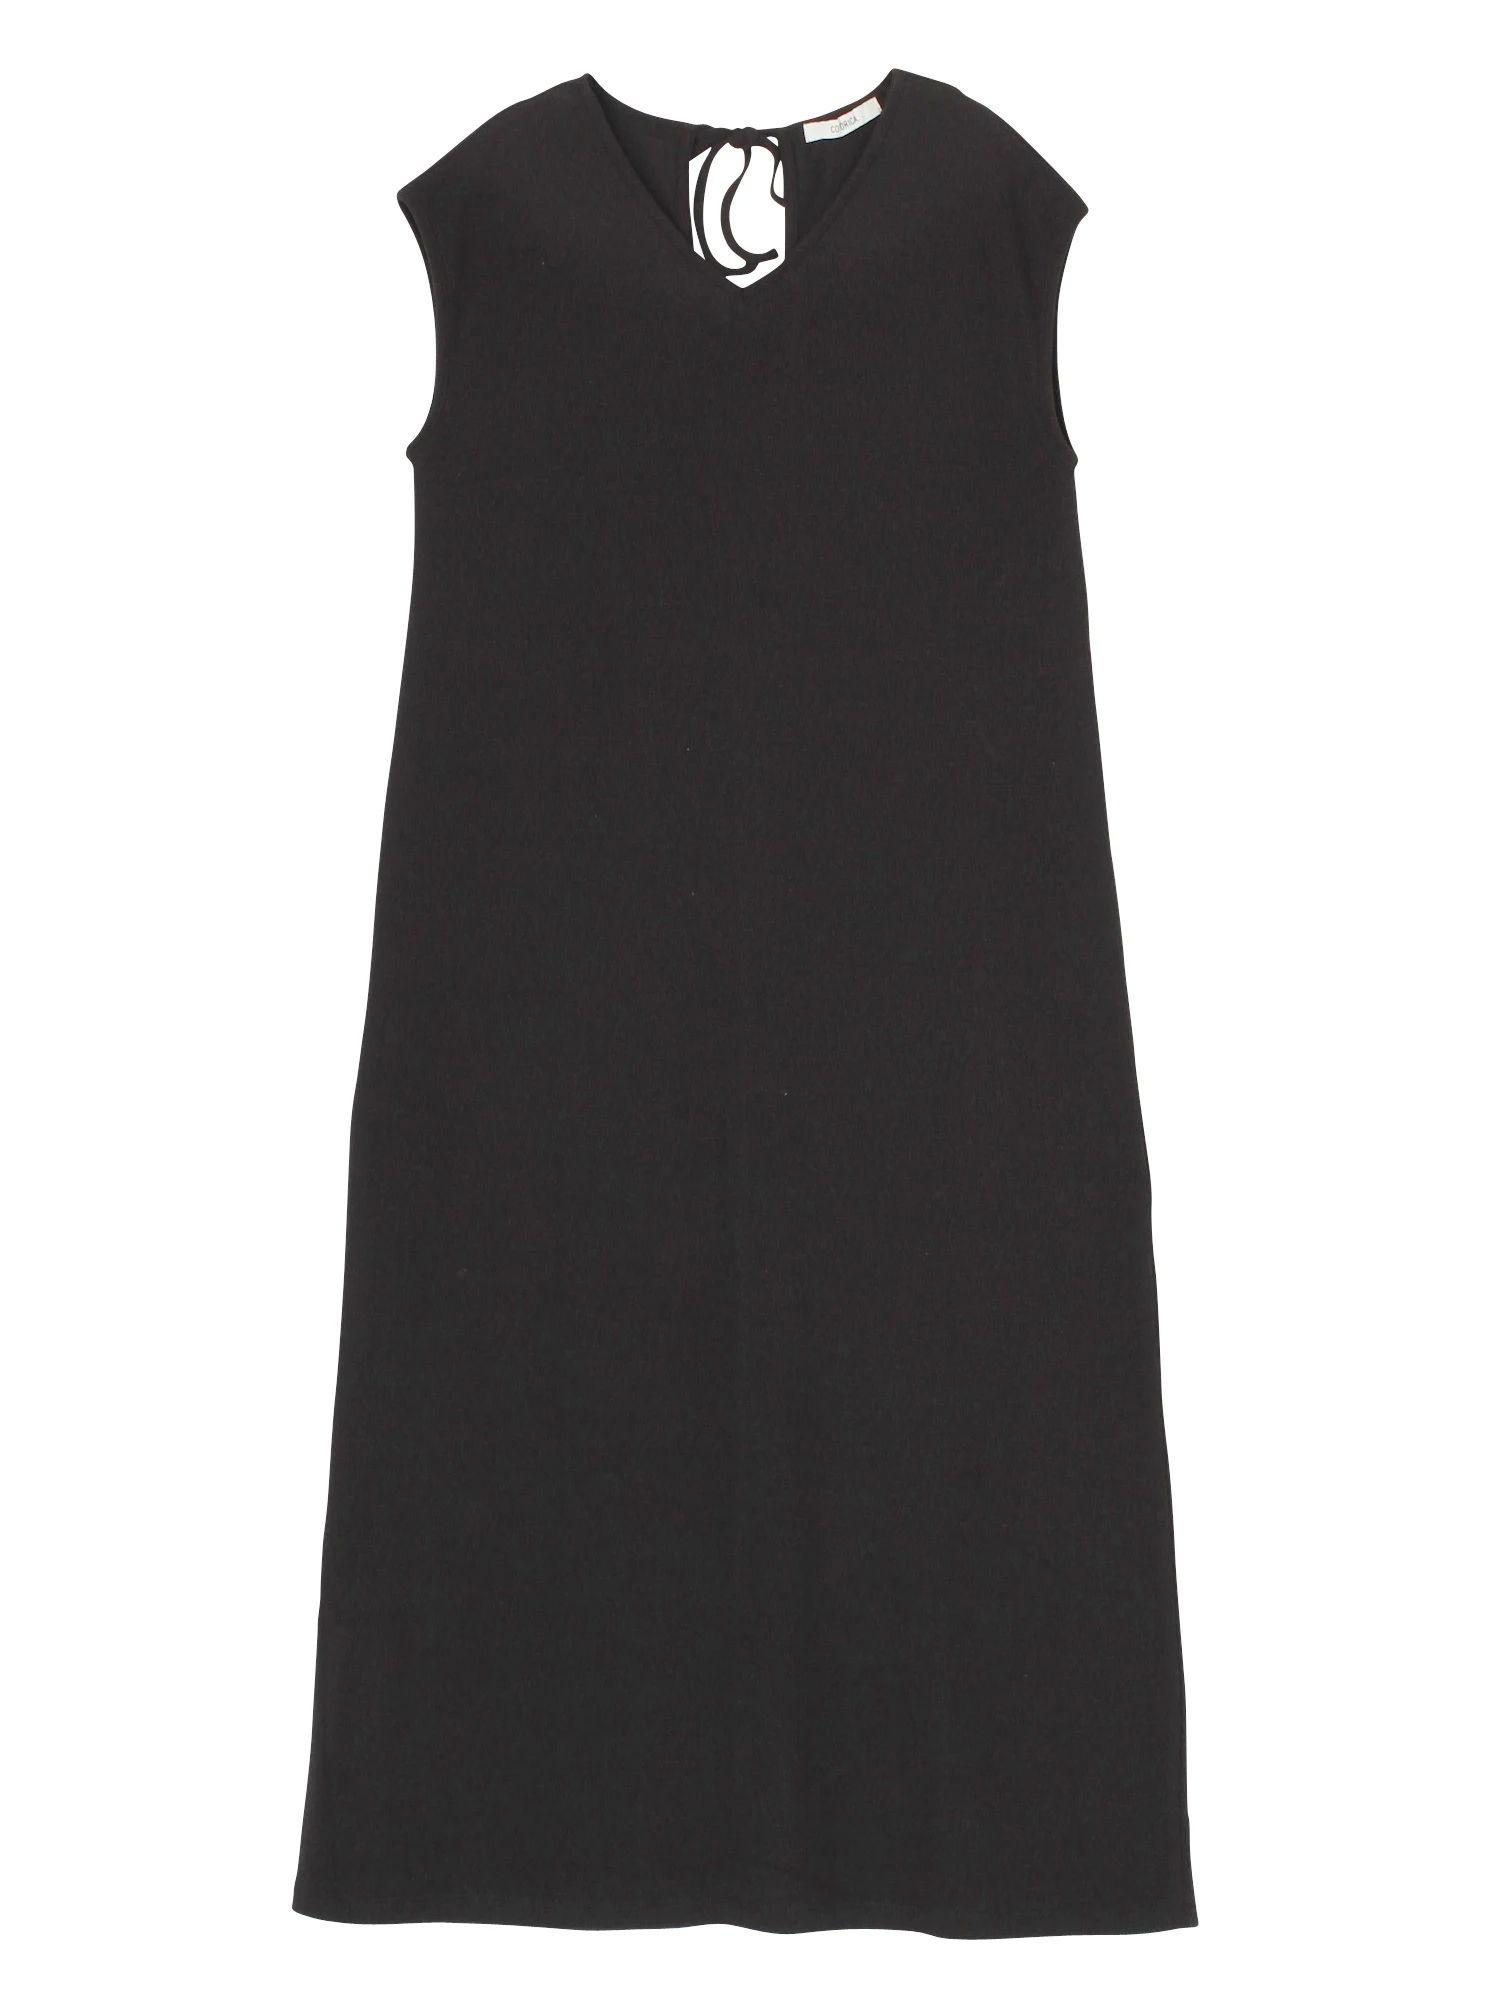 Thermal V-neck dress